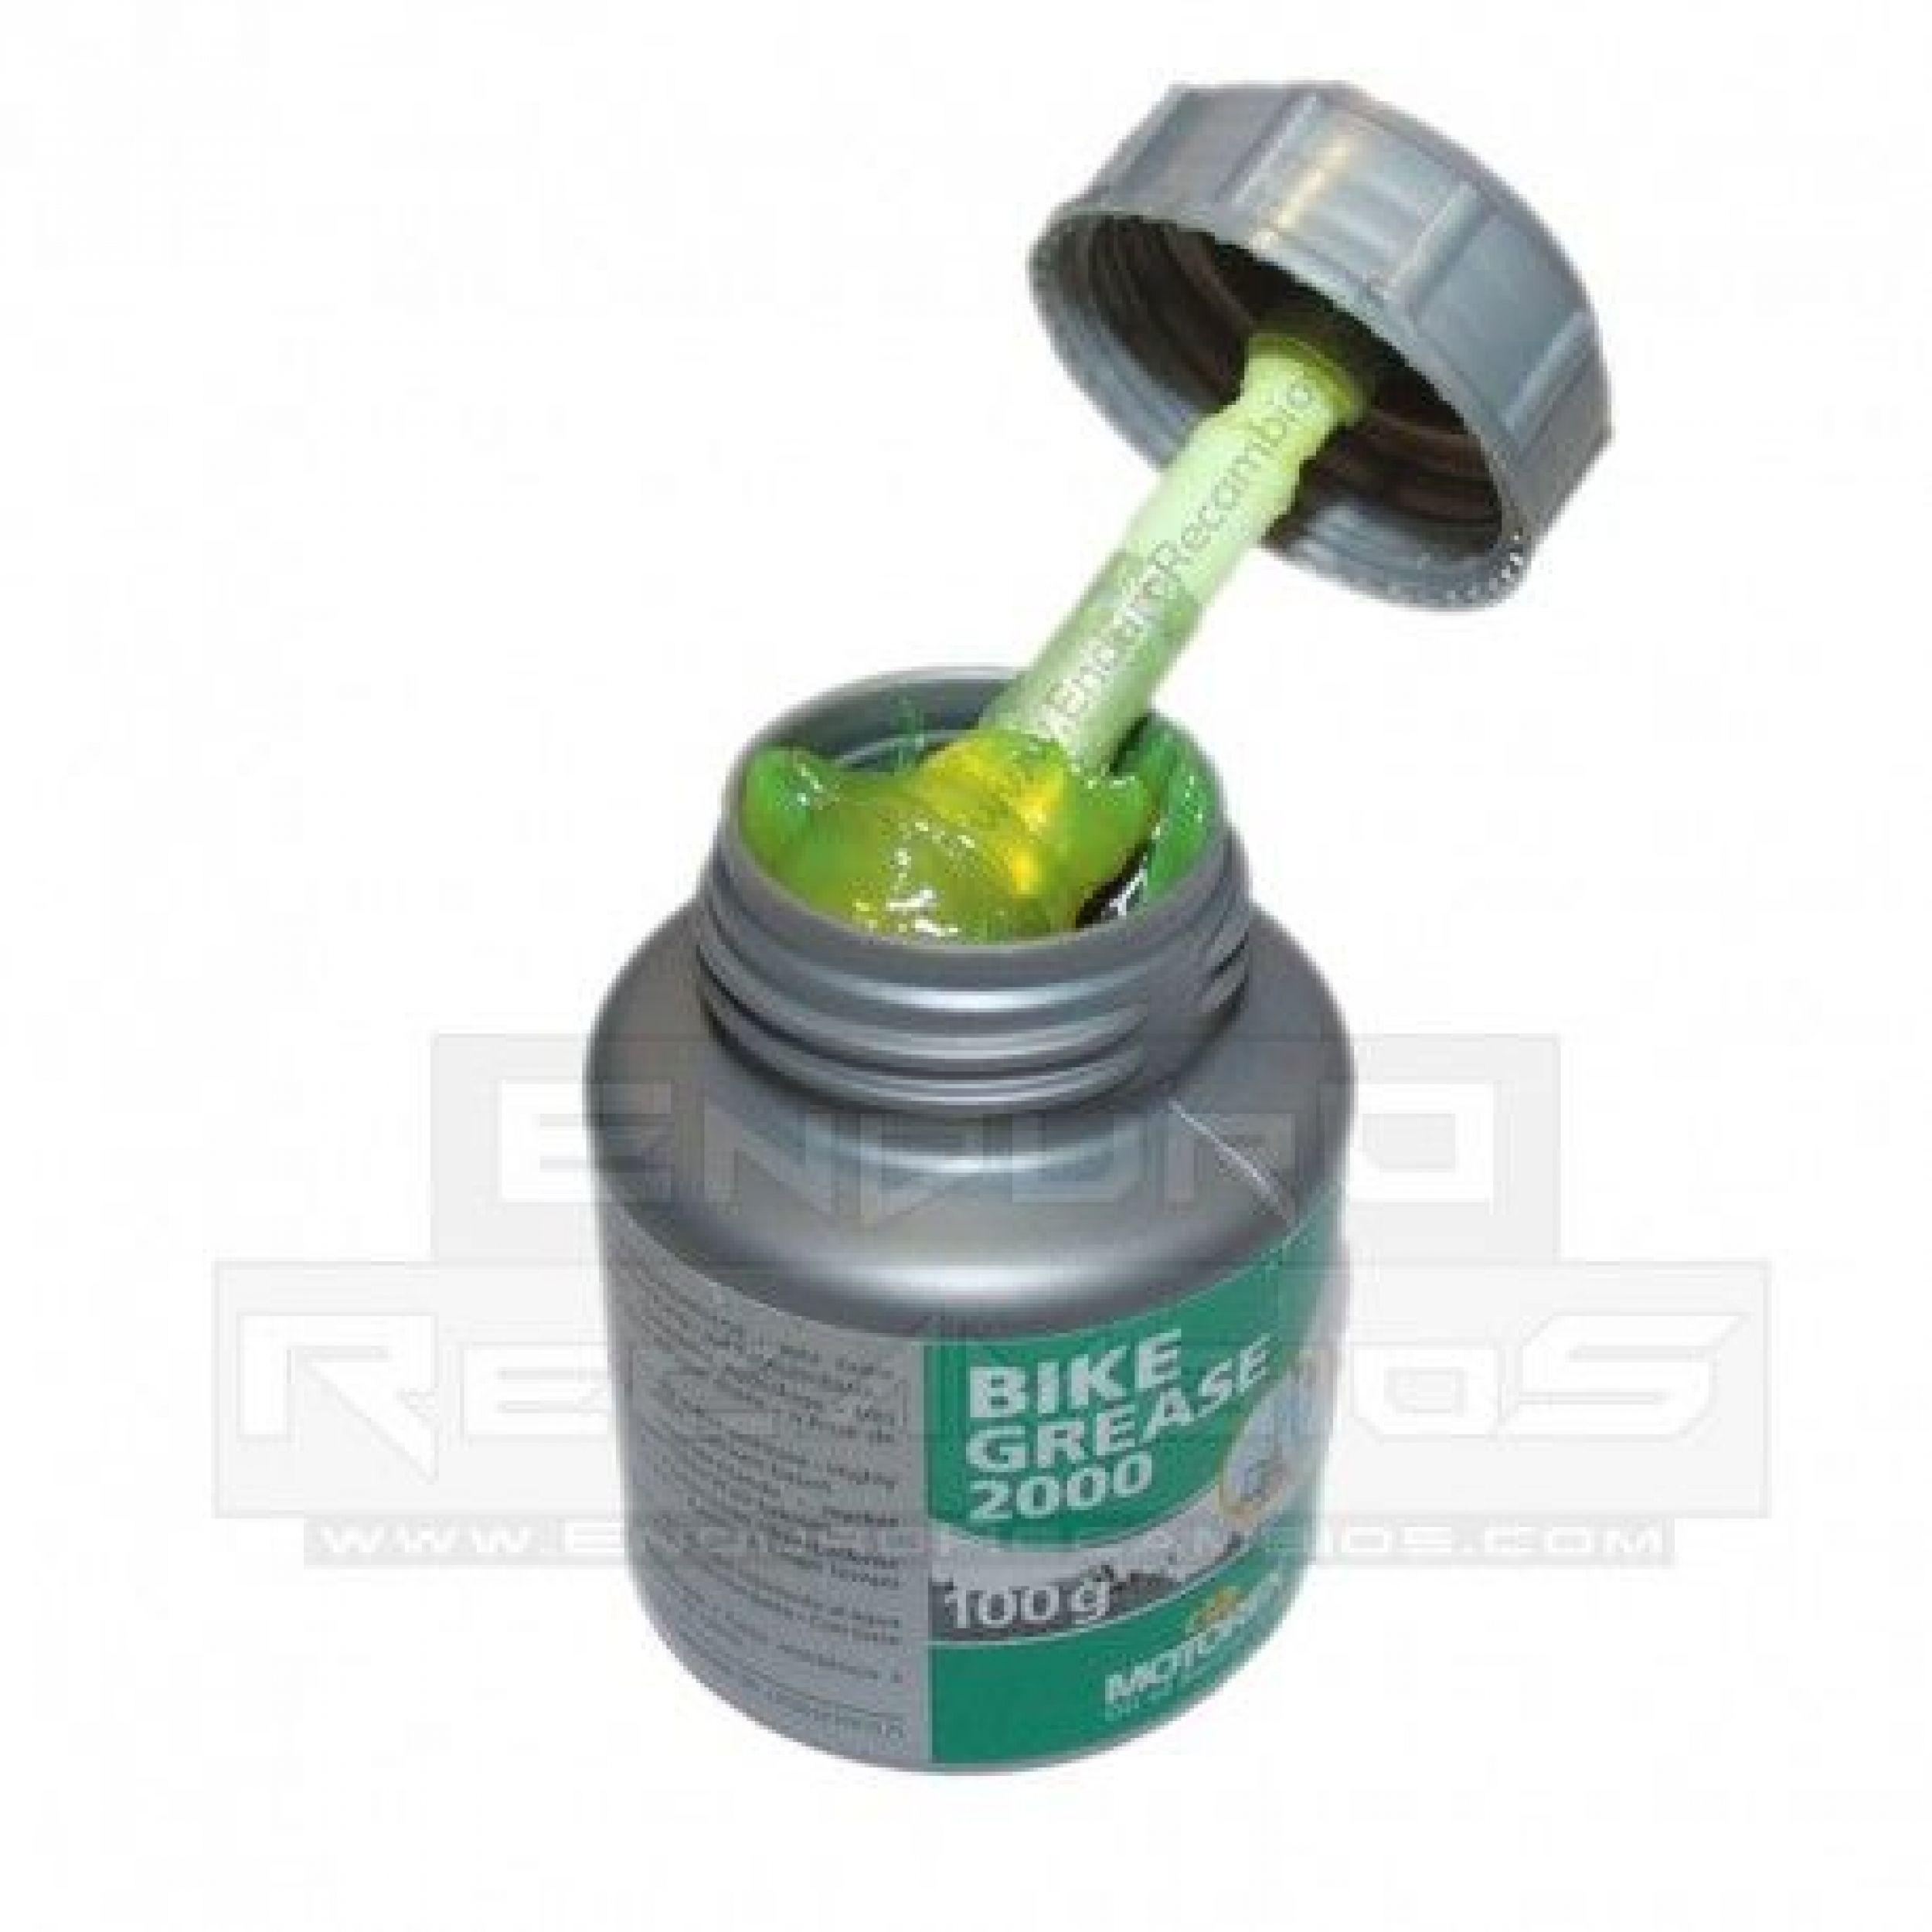 grasa-verde-motorex-longterm-grease-2000-mt009pblpm-.jpg